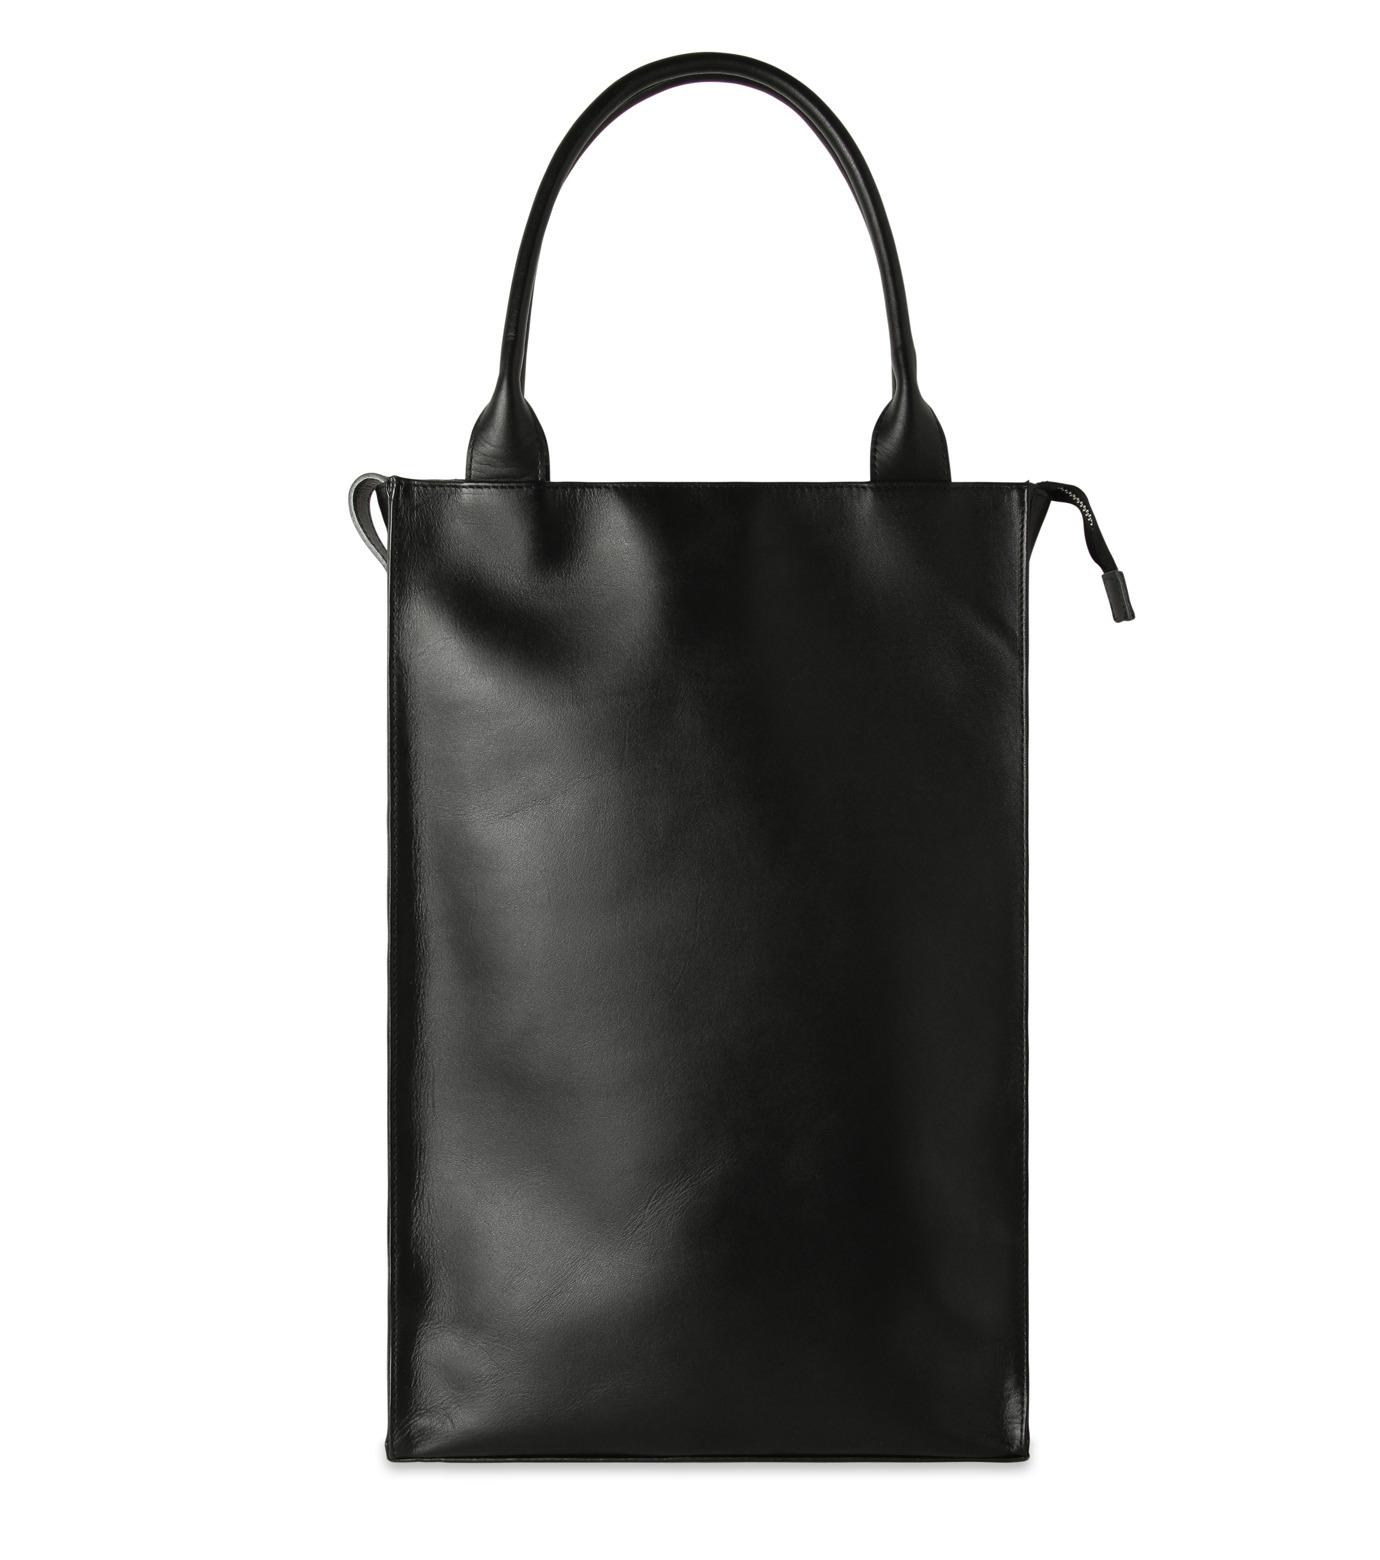 HL HEDDIE LOVU(エイチエル・エディールーヴ)のHL Tote Bag-BLACK(バッグ/bag)-16A90007-13 拡大詳細画像1